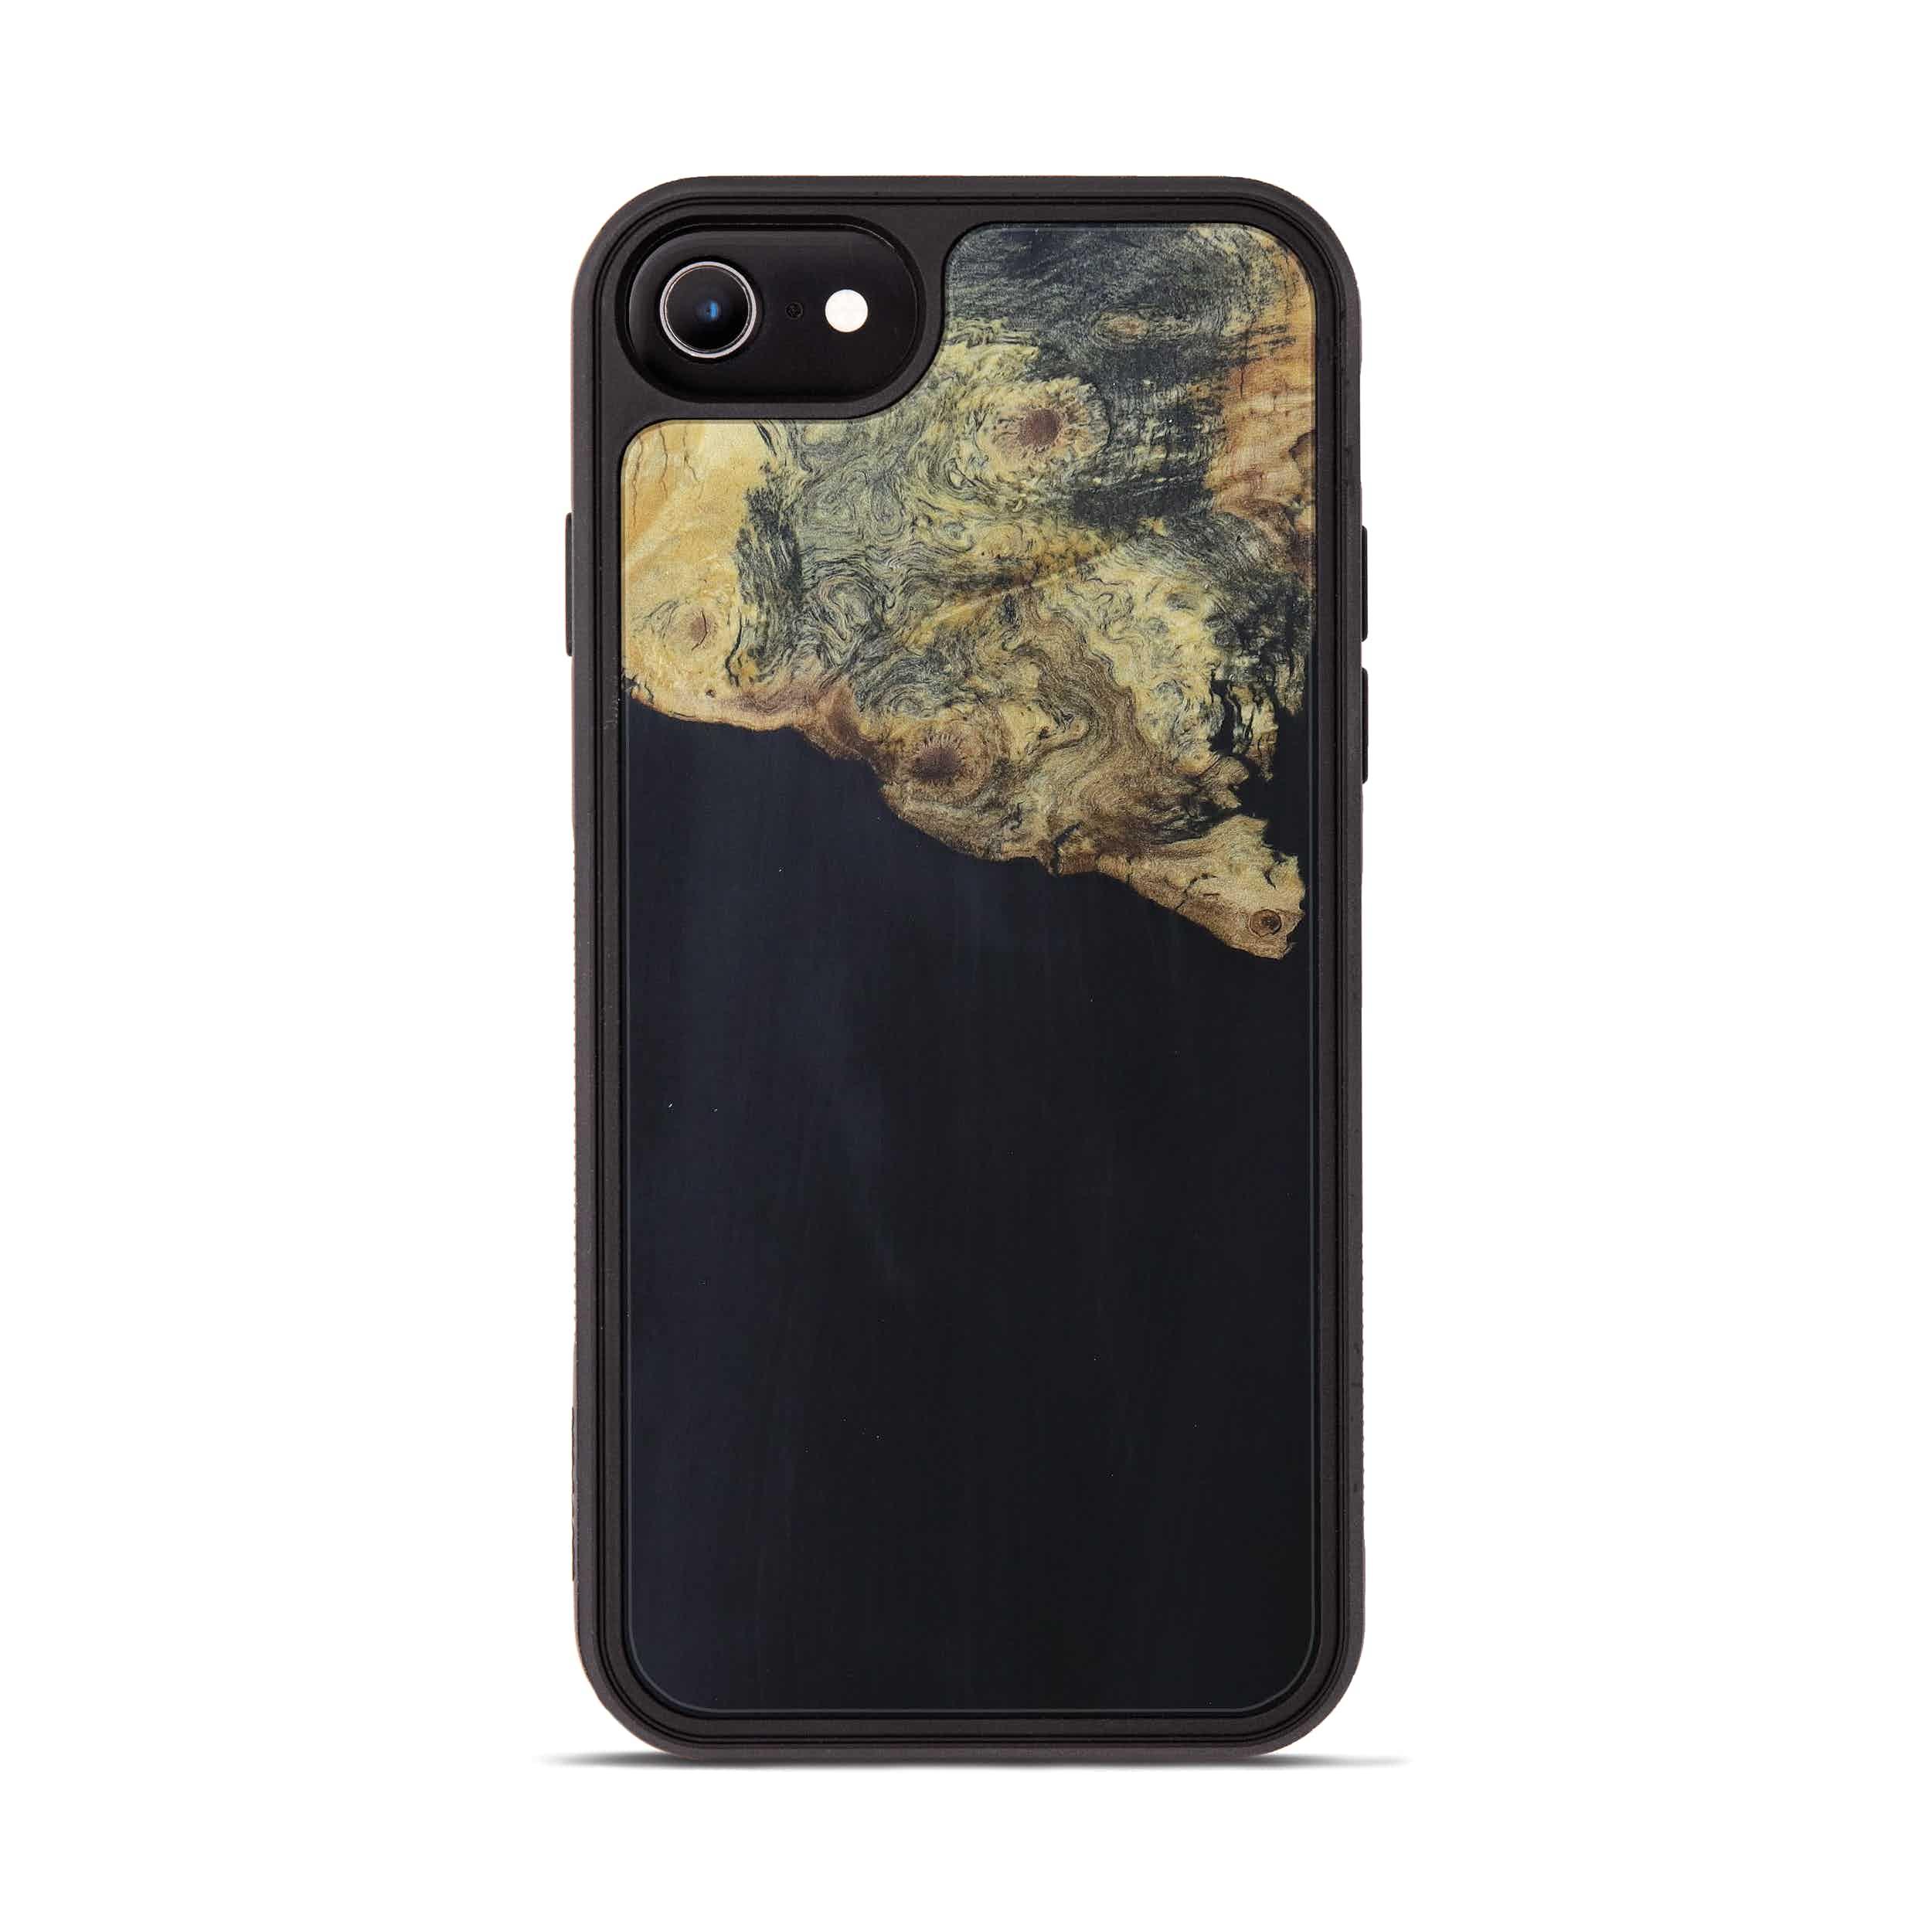 iPhone 6s Wood+Resin Phone Case - Arabel (Pure Black, 394228)